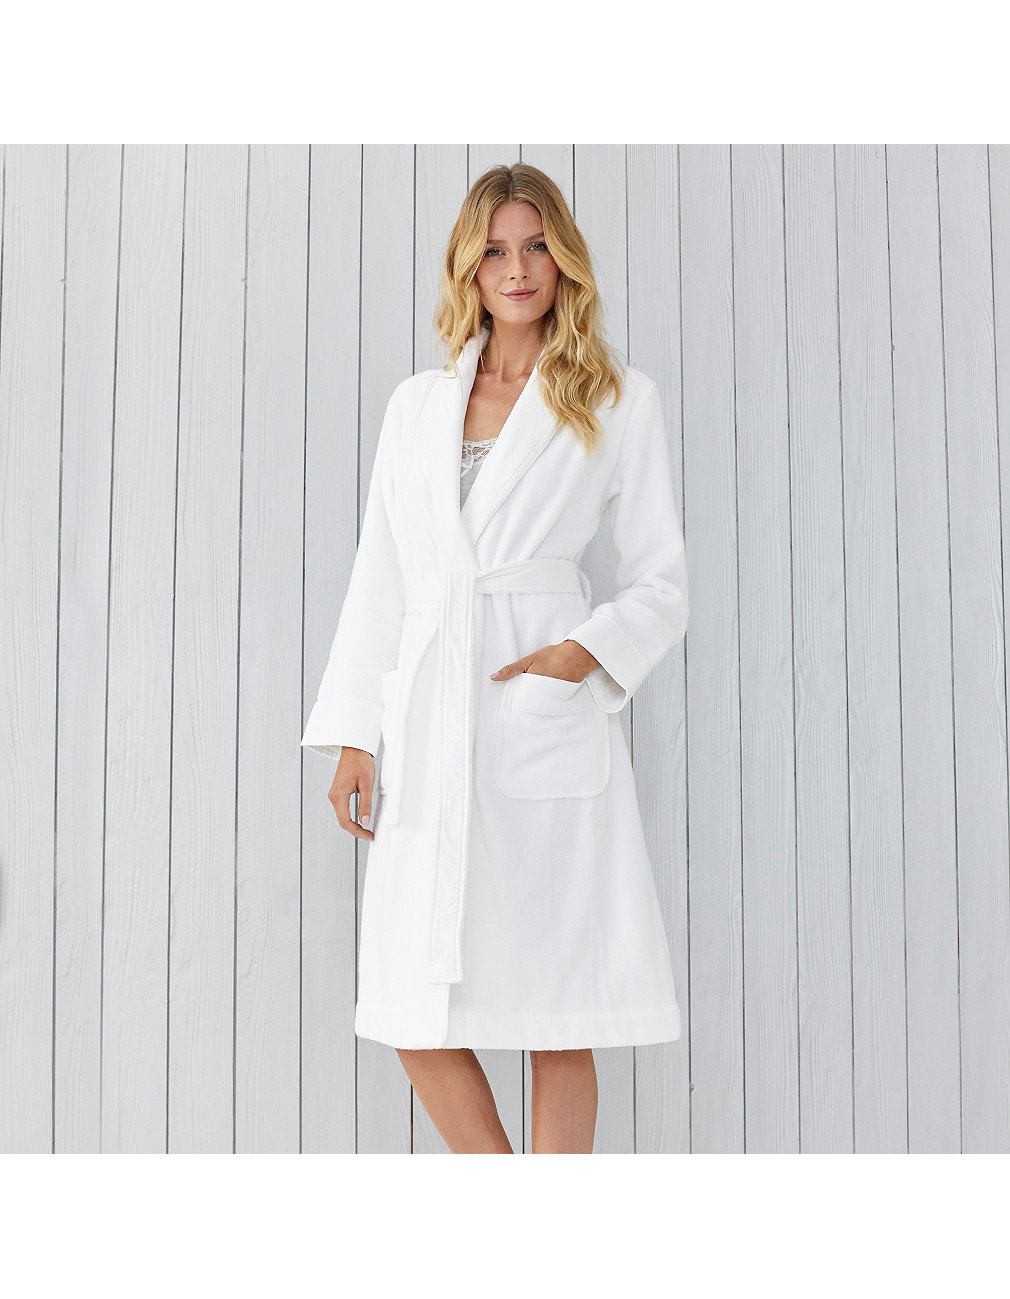 Luxury hotel robe   Nightwear & Robes Sale   The White Company UK